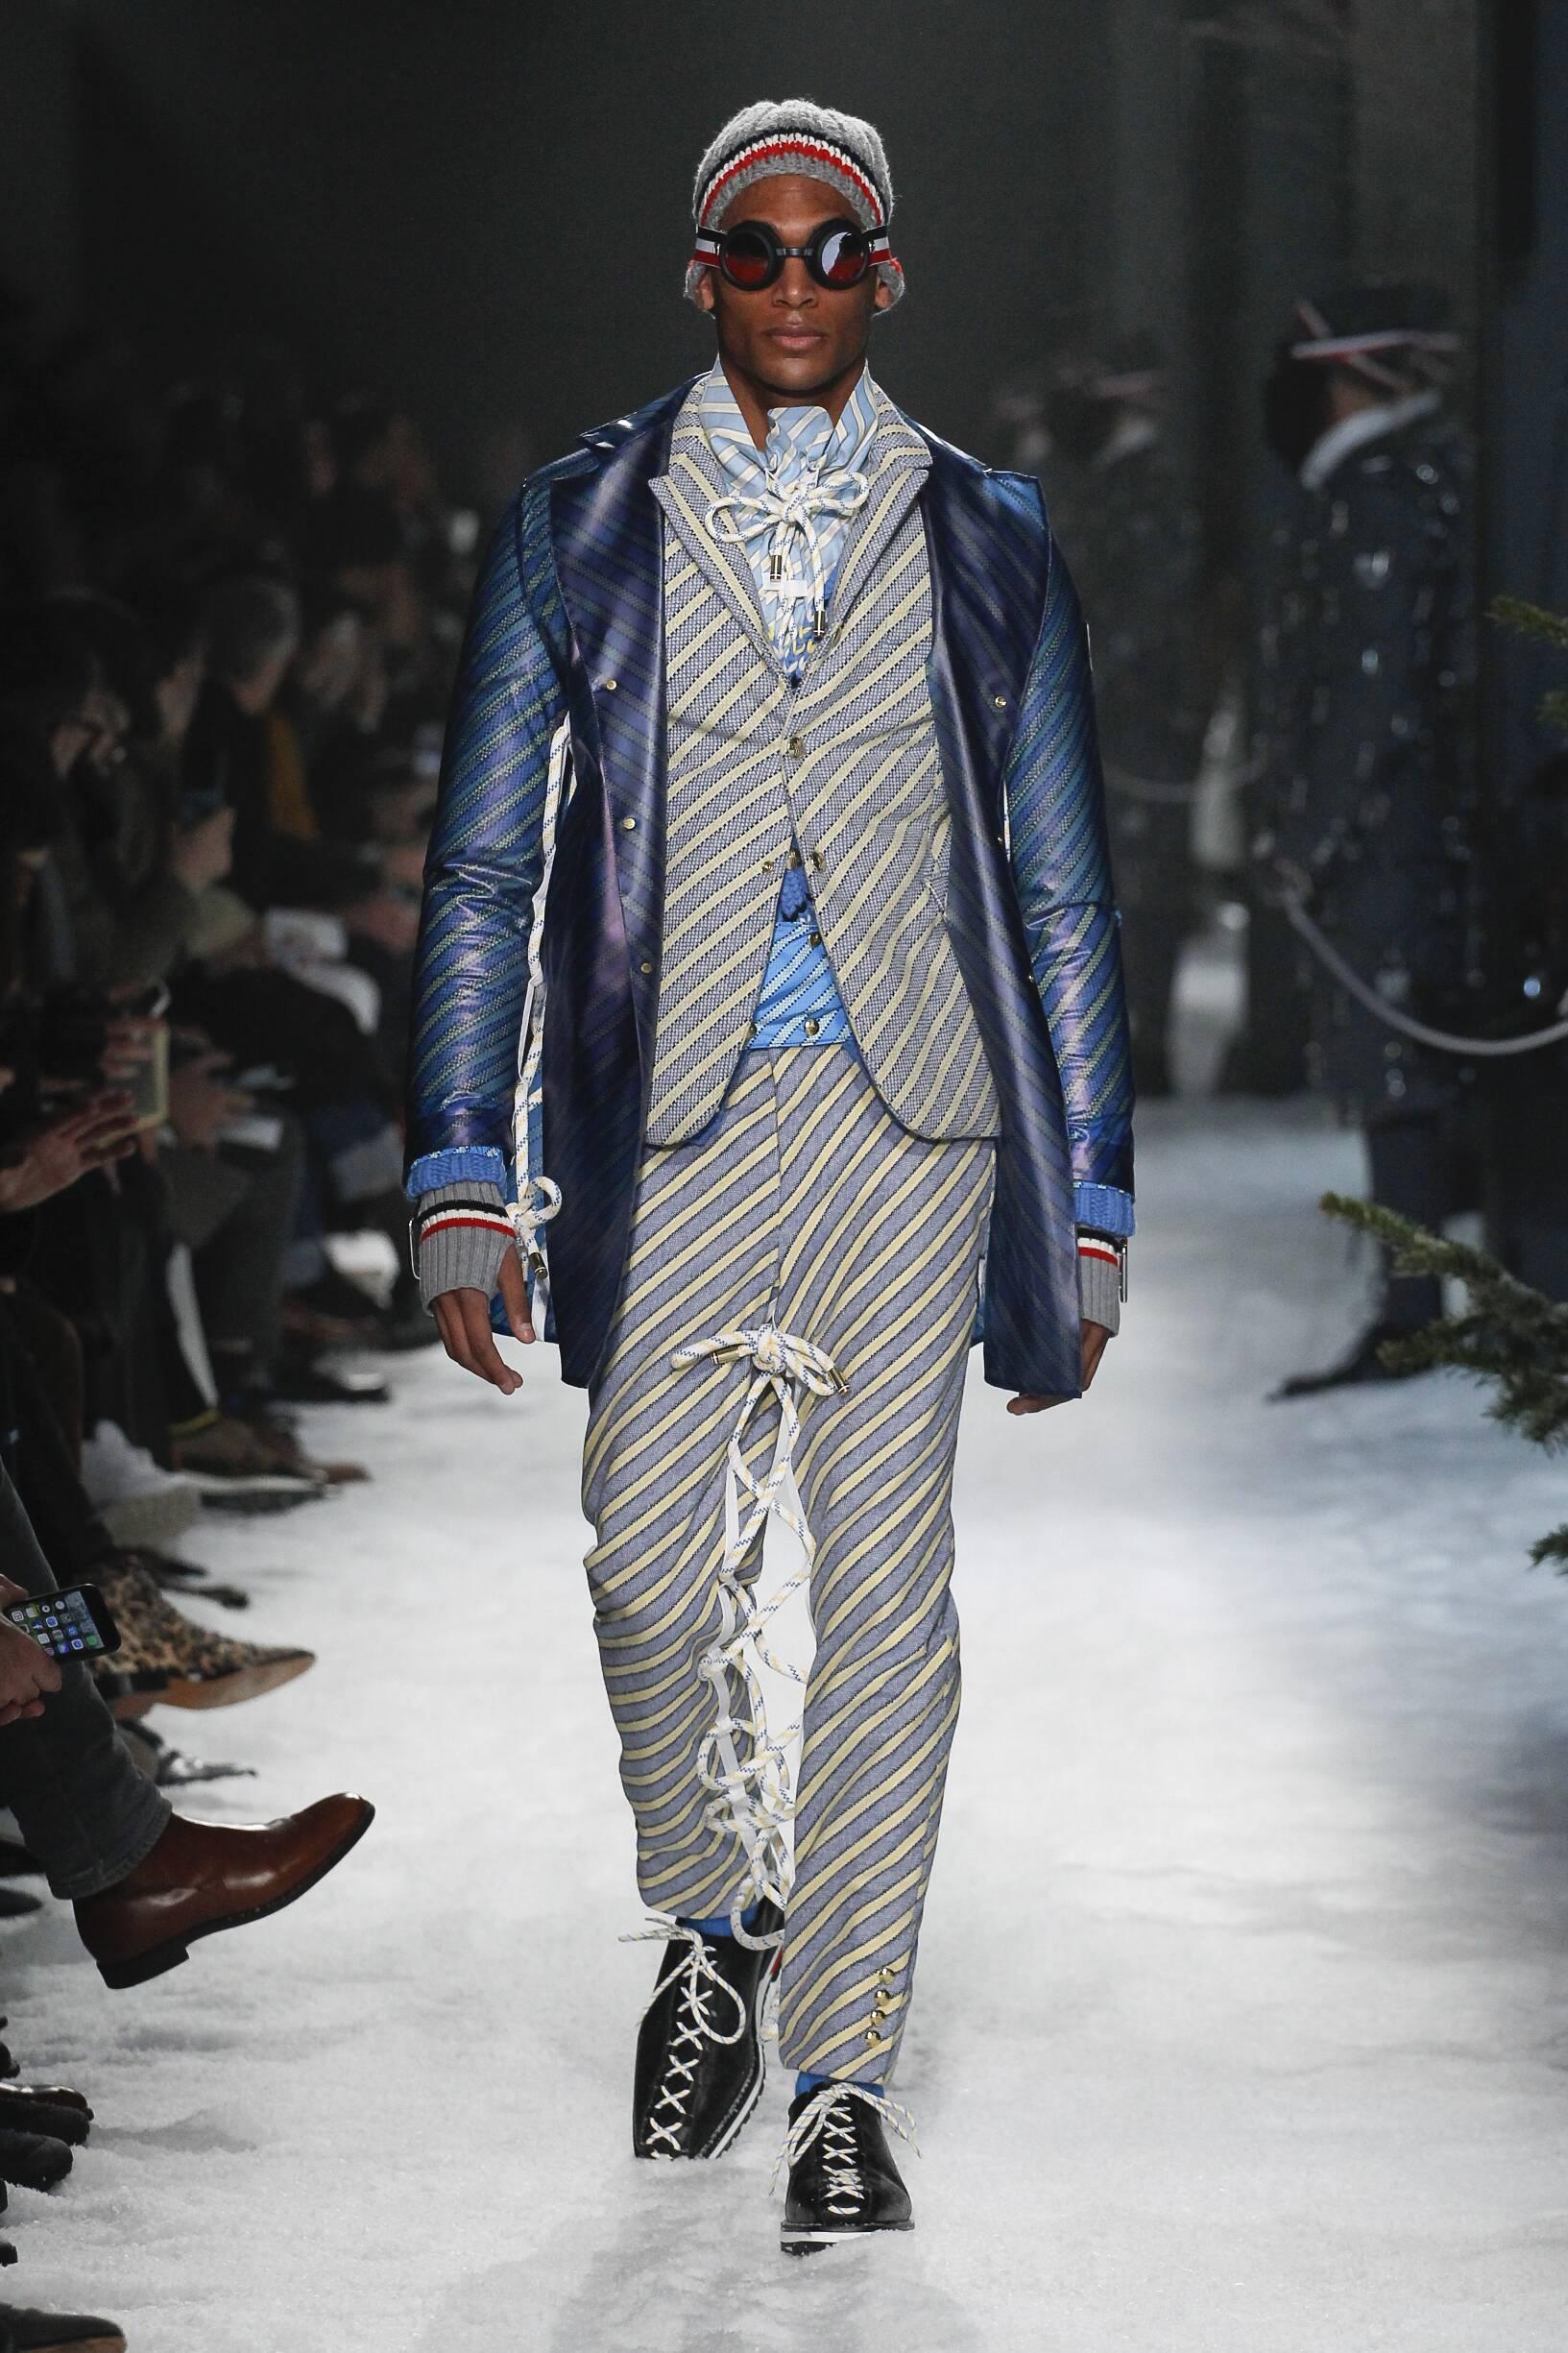 Moncler Gamme Bleu Fall Winter 2017